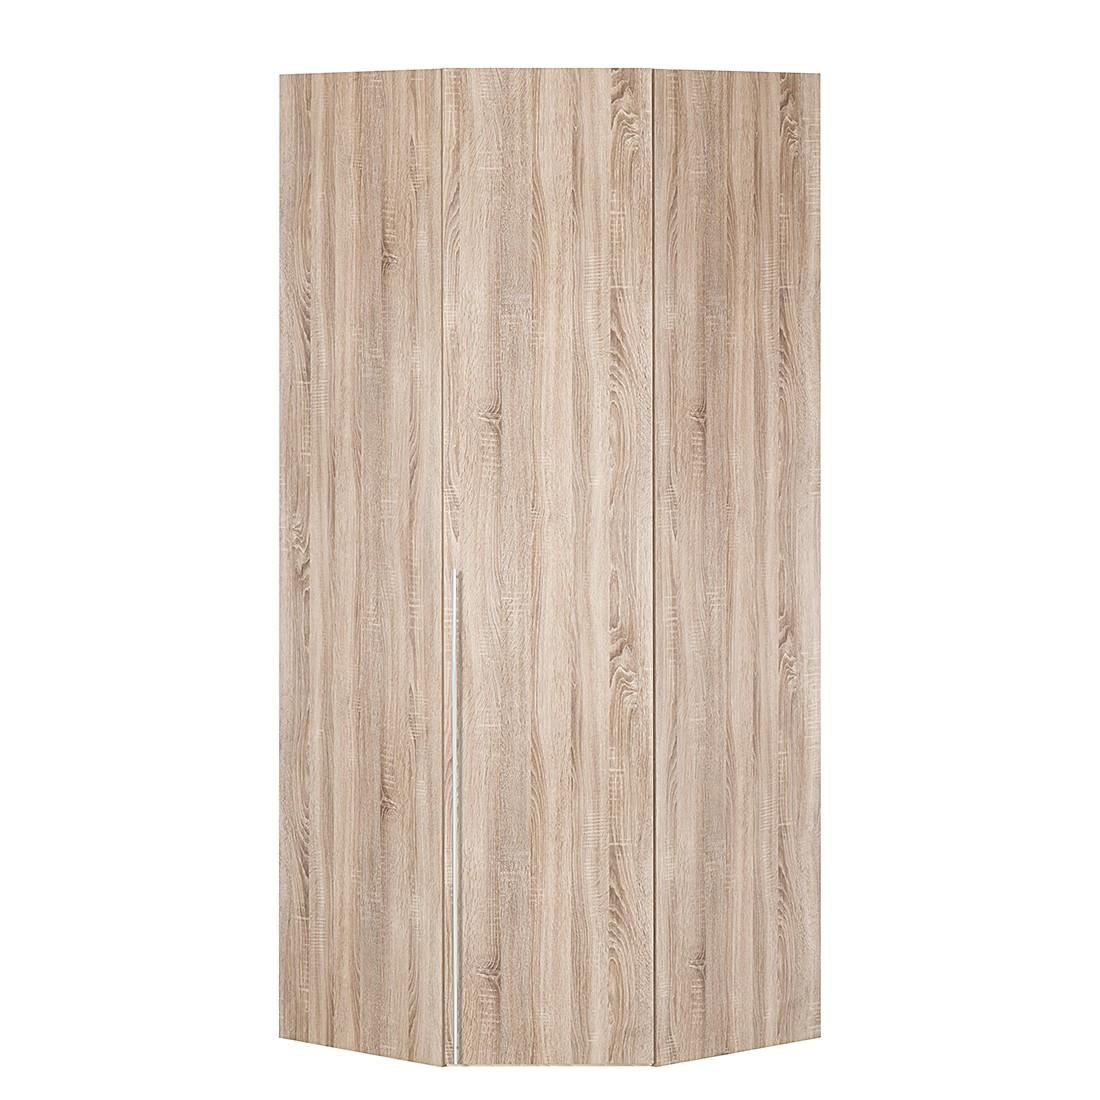 Armoire d'angle Brooklyn II - Imitation chêne de Sonoma - 216 cm, Express Möbel